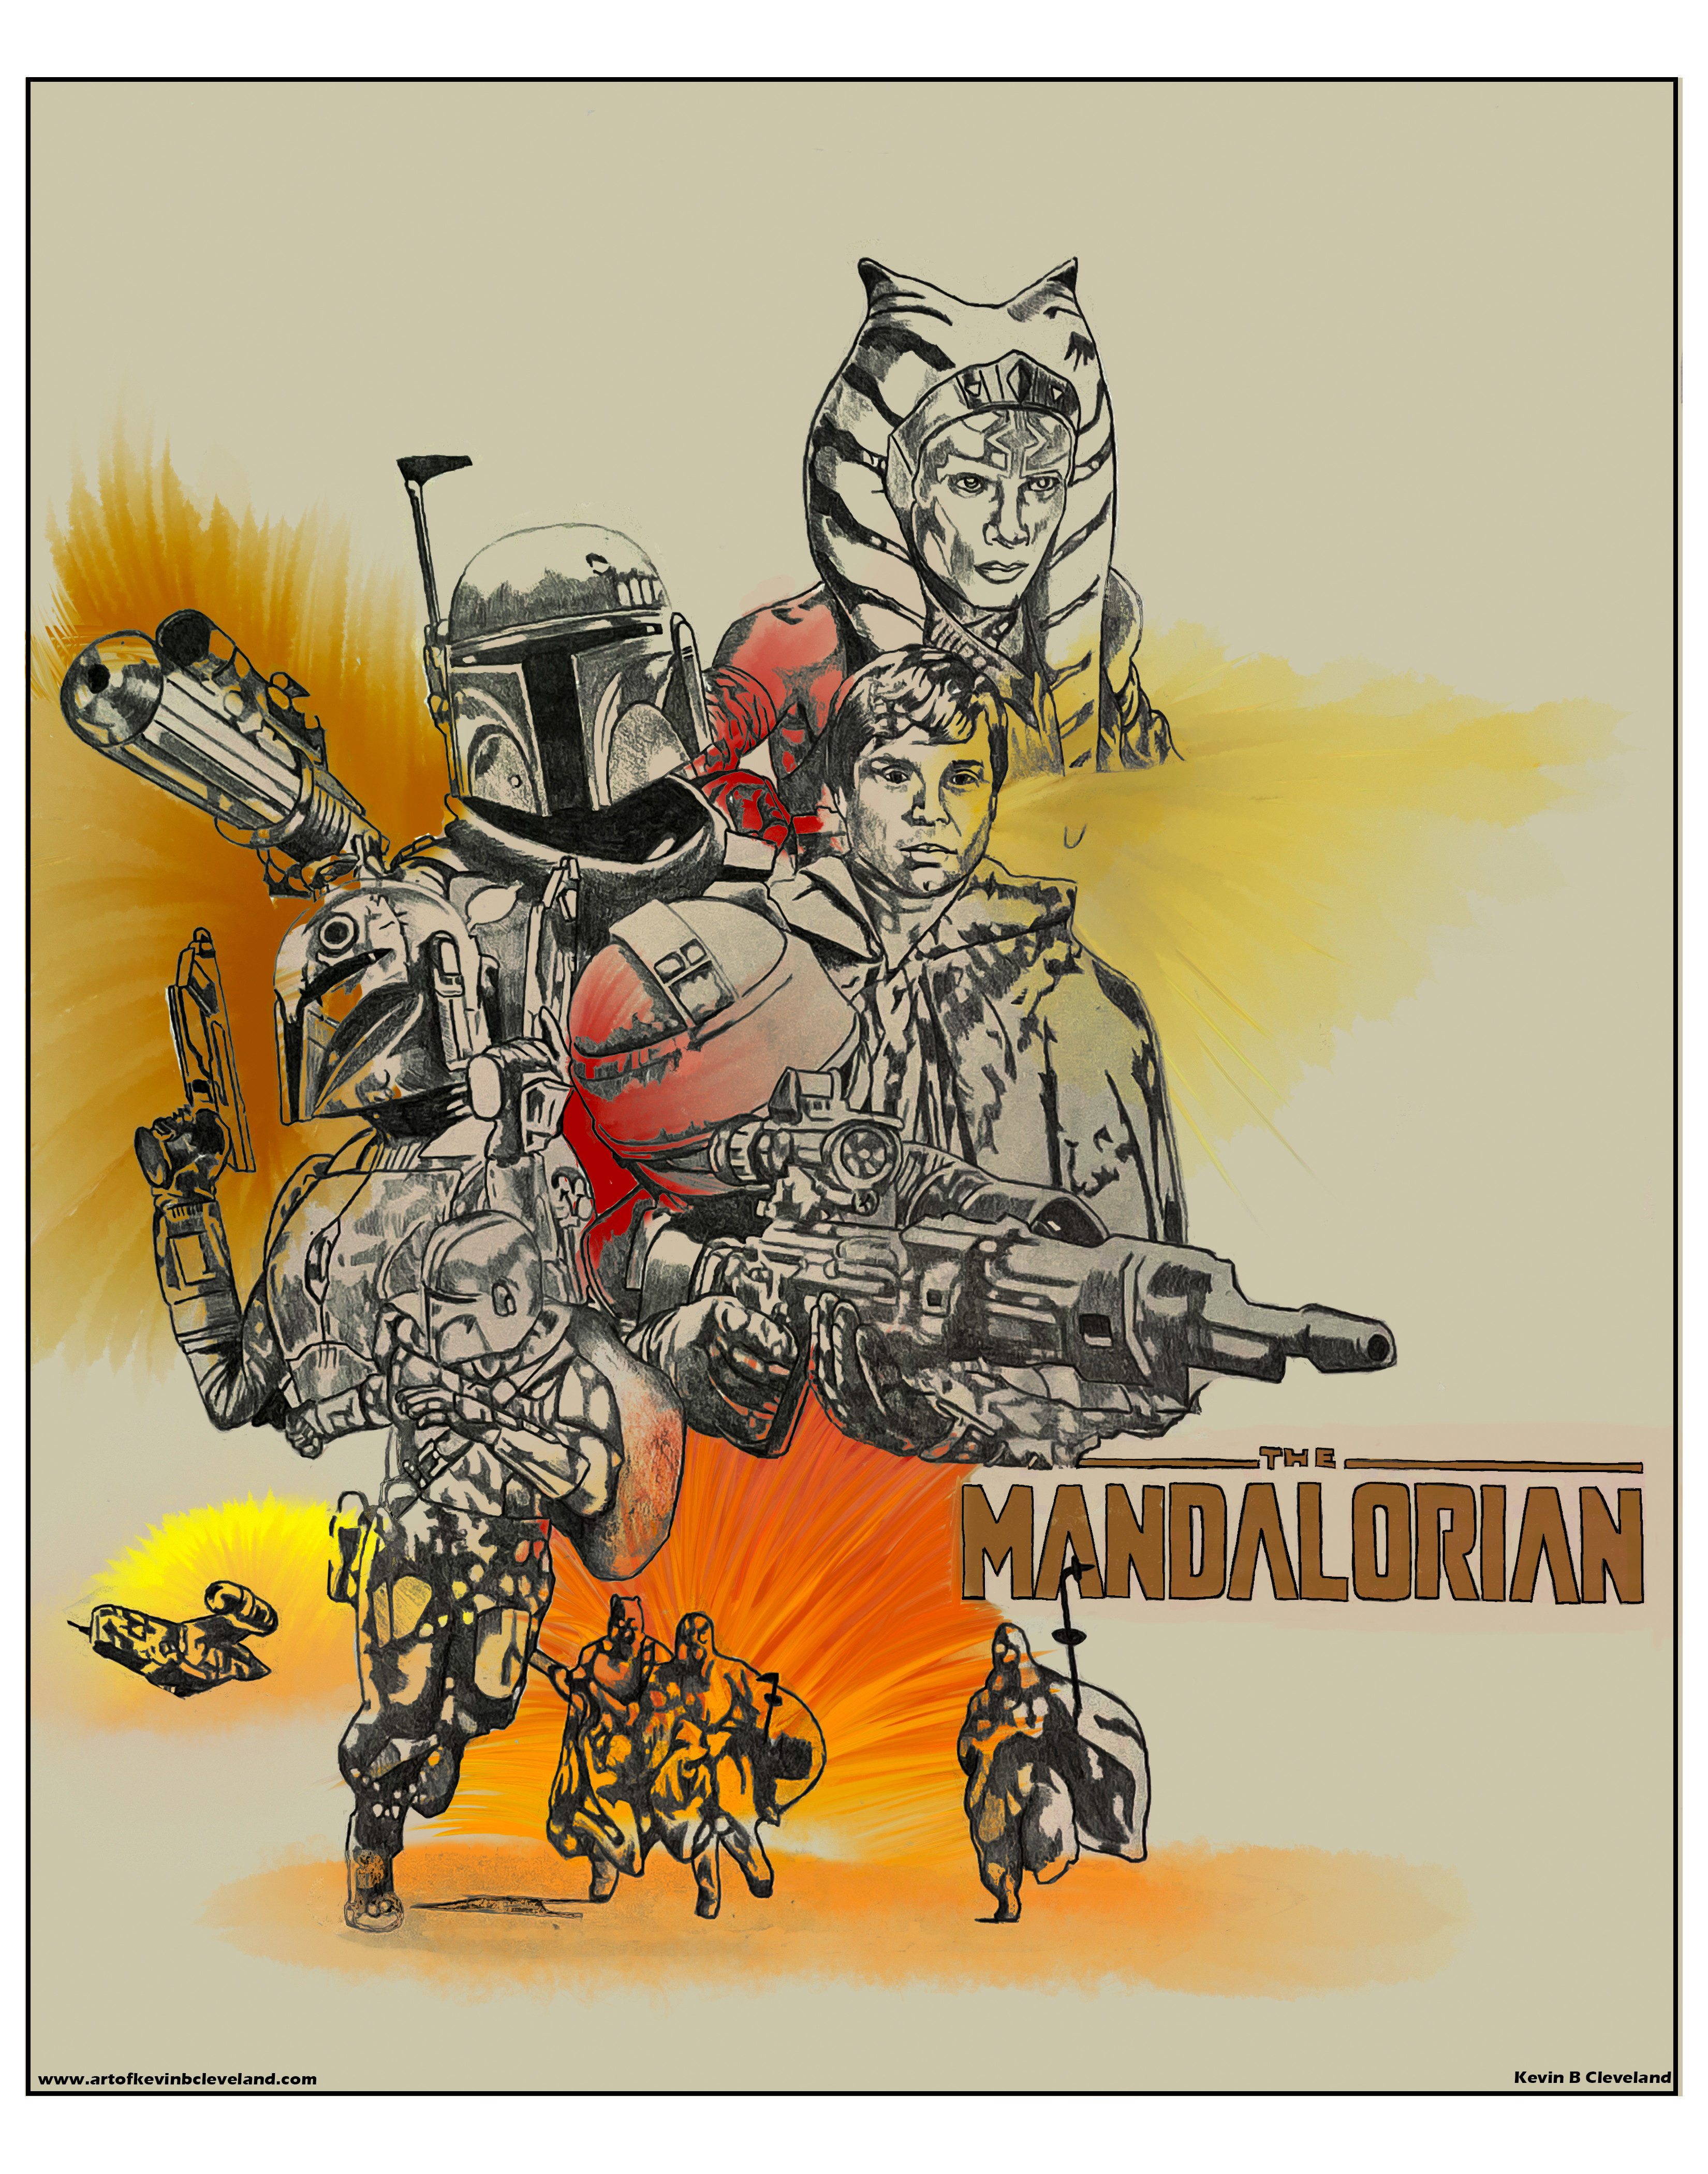 Mandalorian Season 2 poster mock up (playing with paint)